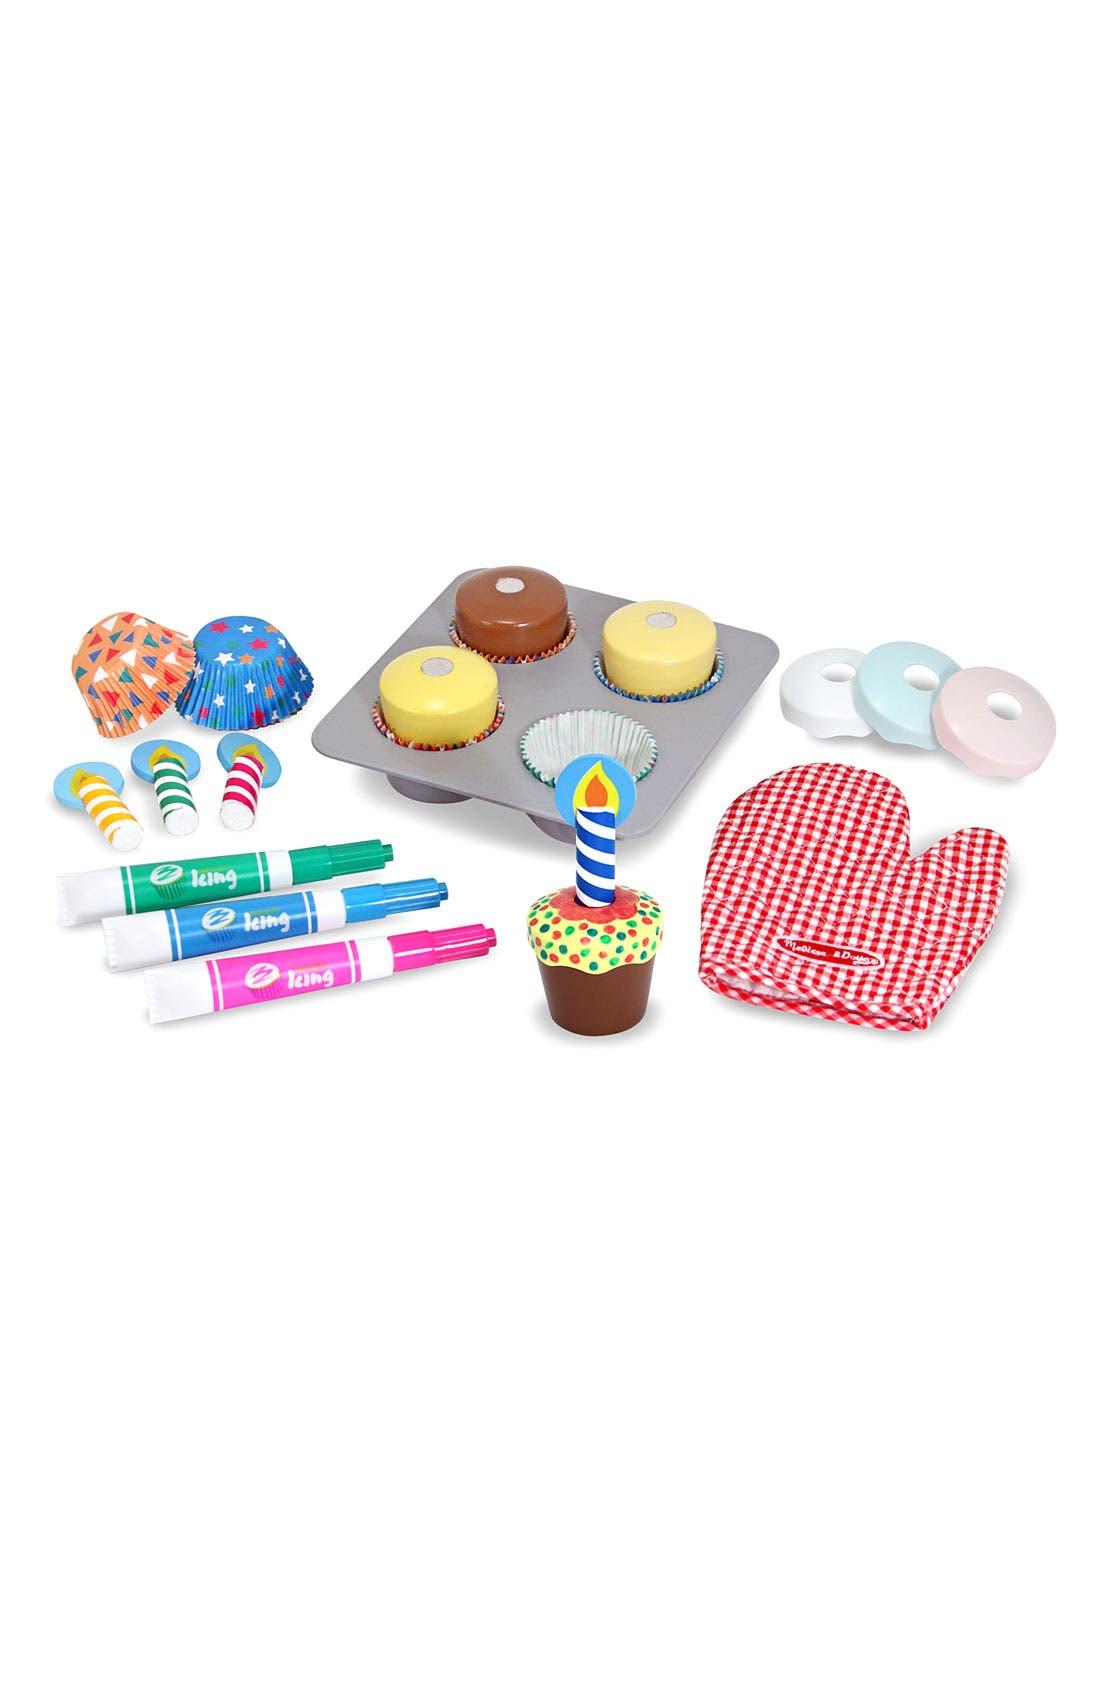 Melissa & Doug Toy Cupcake Set